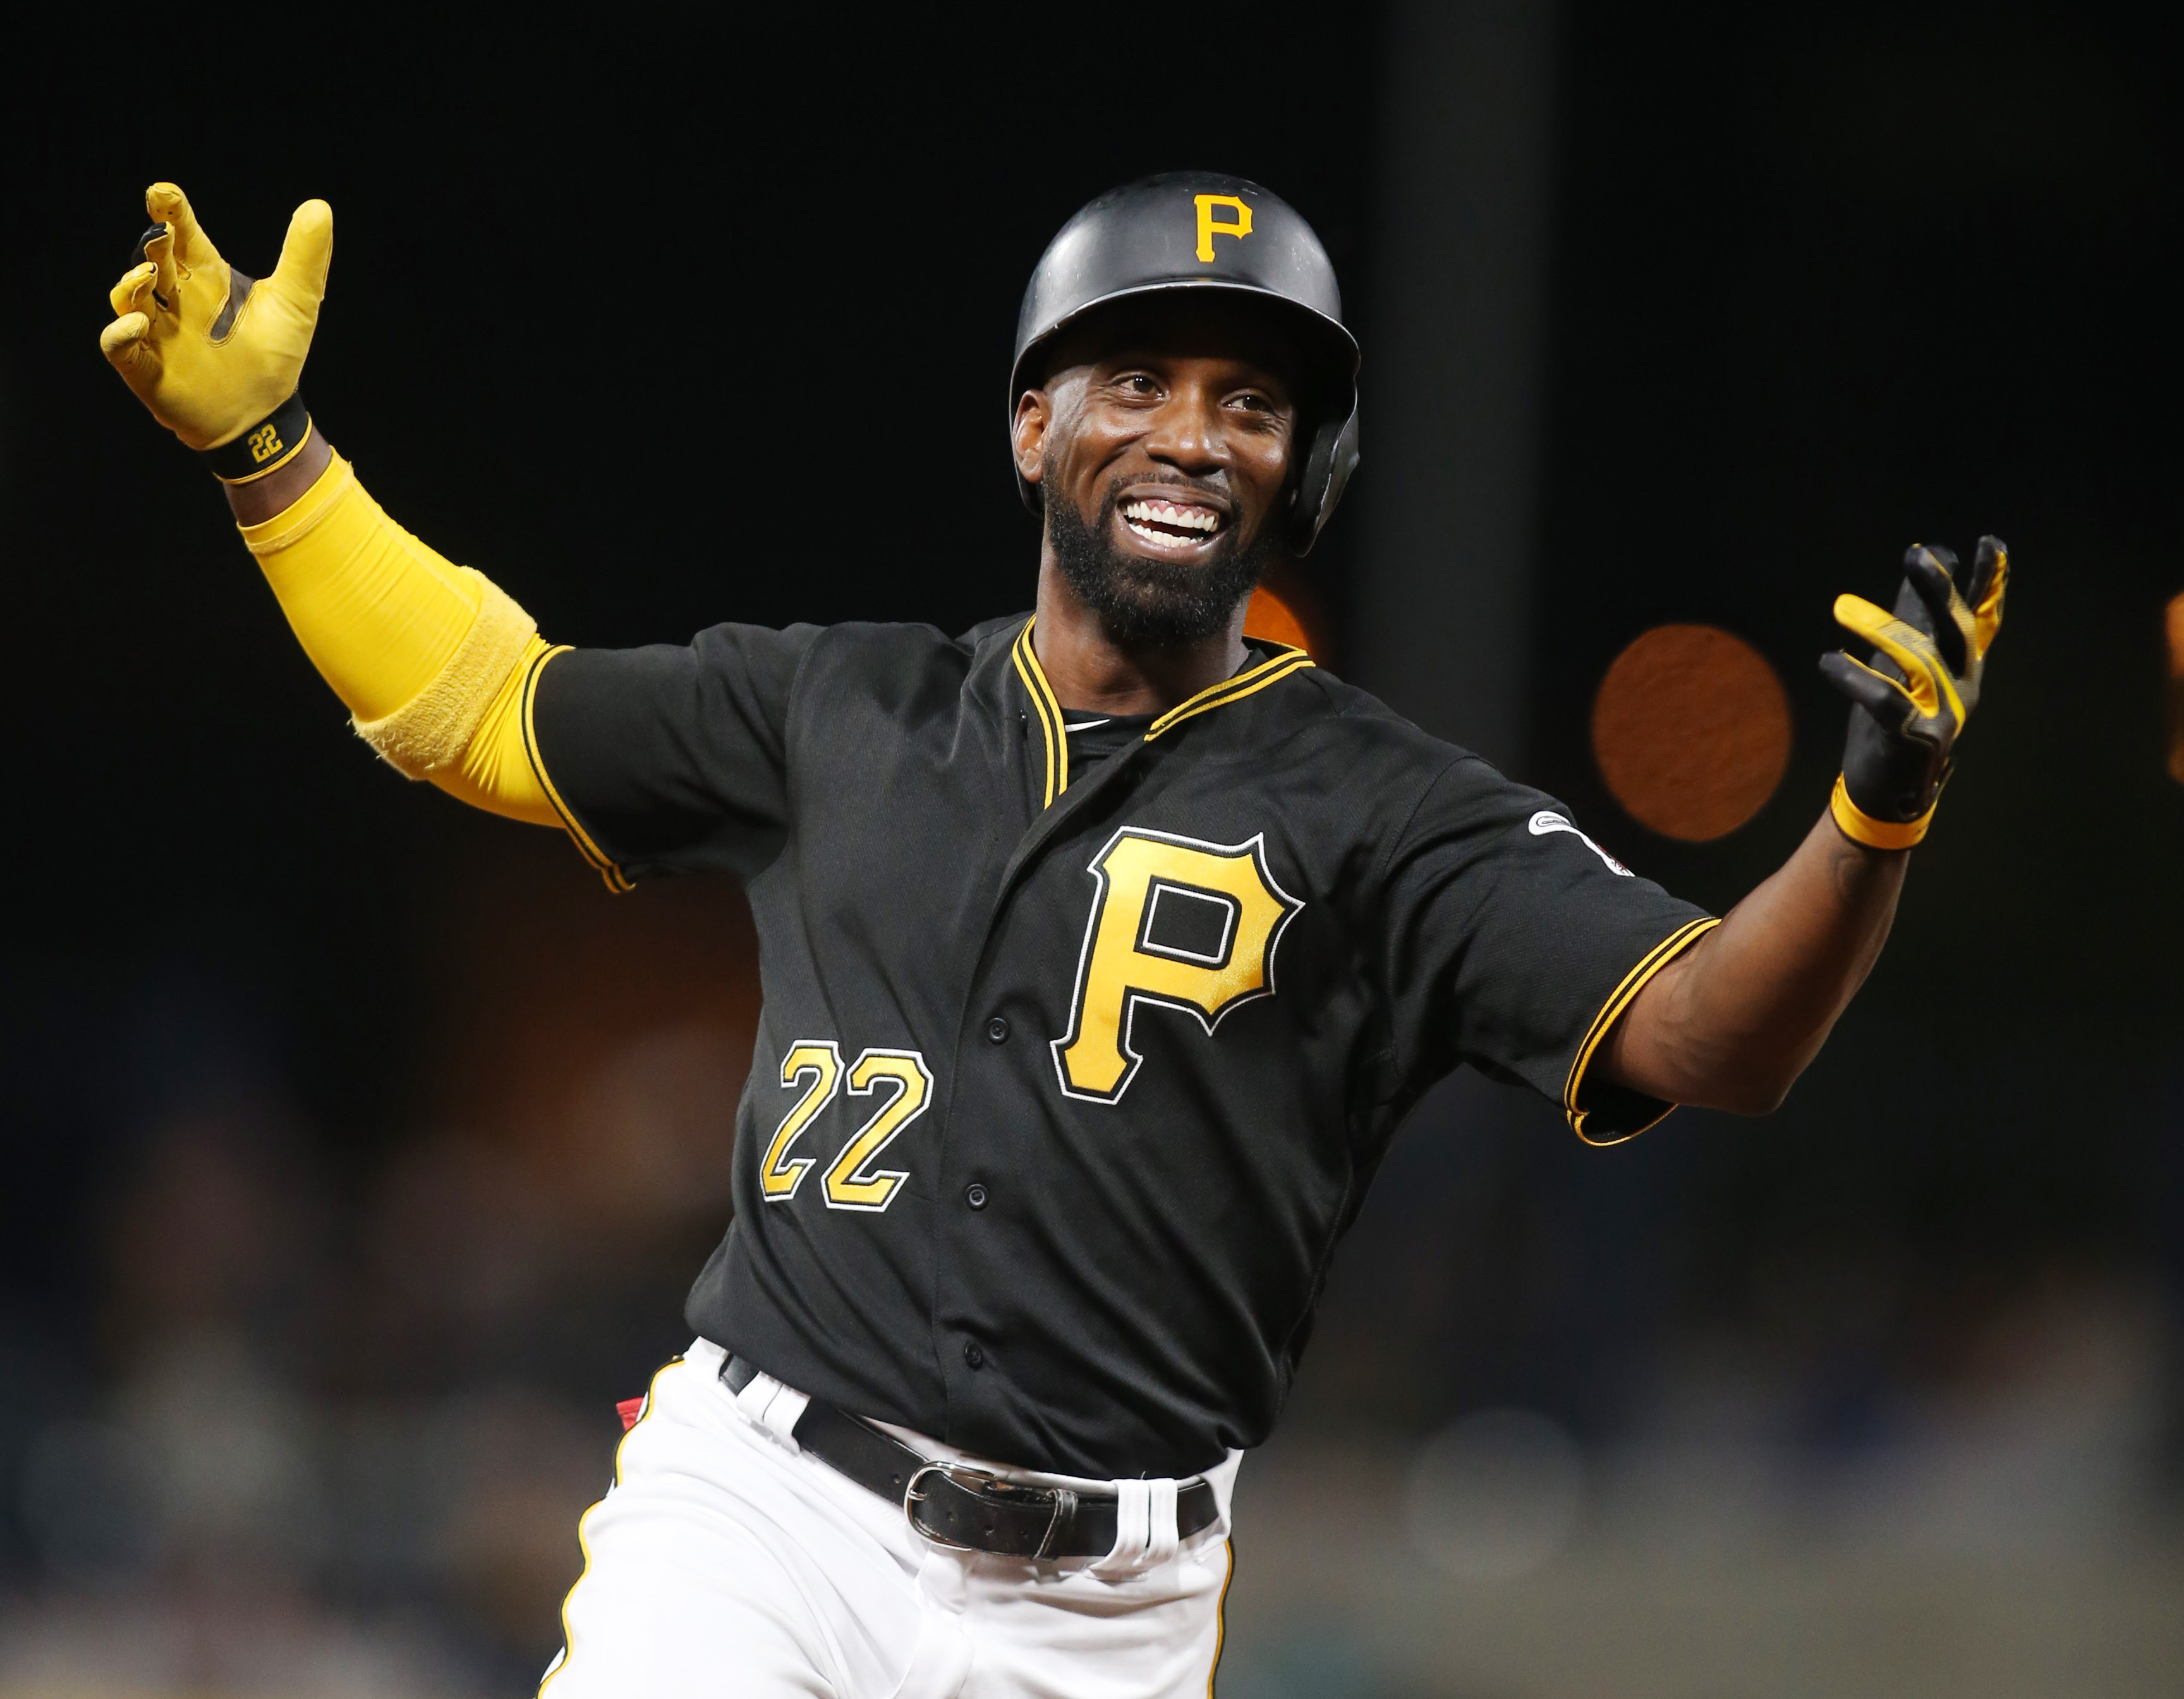 MLB:Pittsburgh海盗的巴尔的摩天才